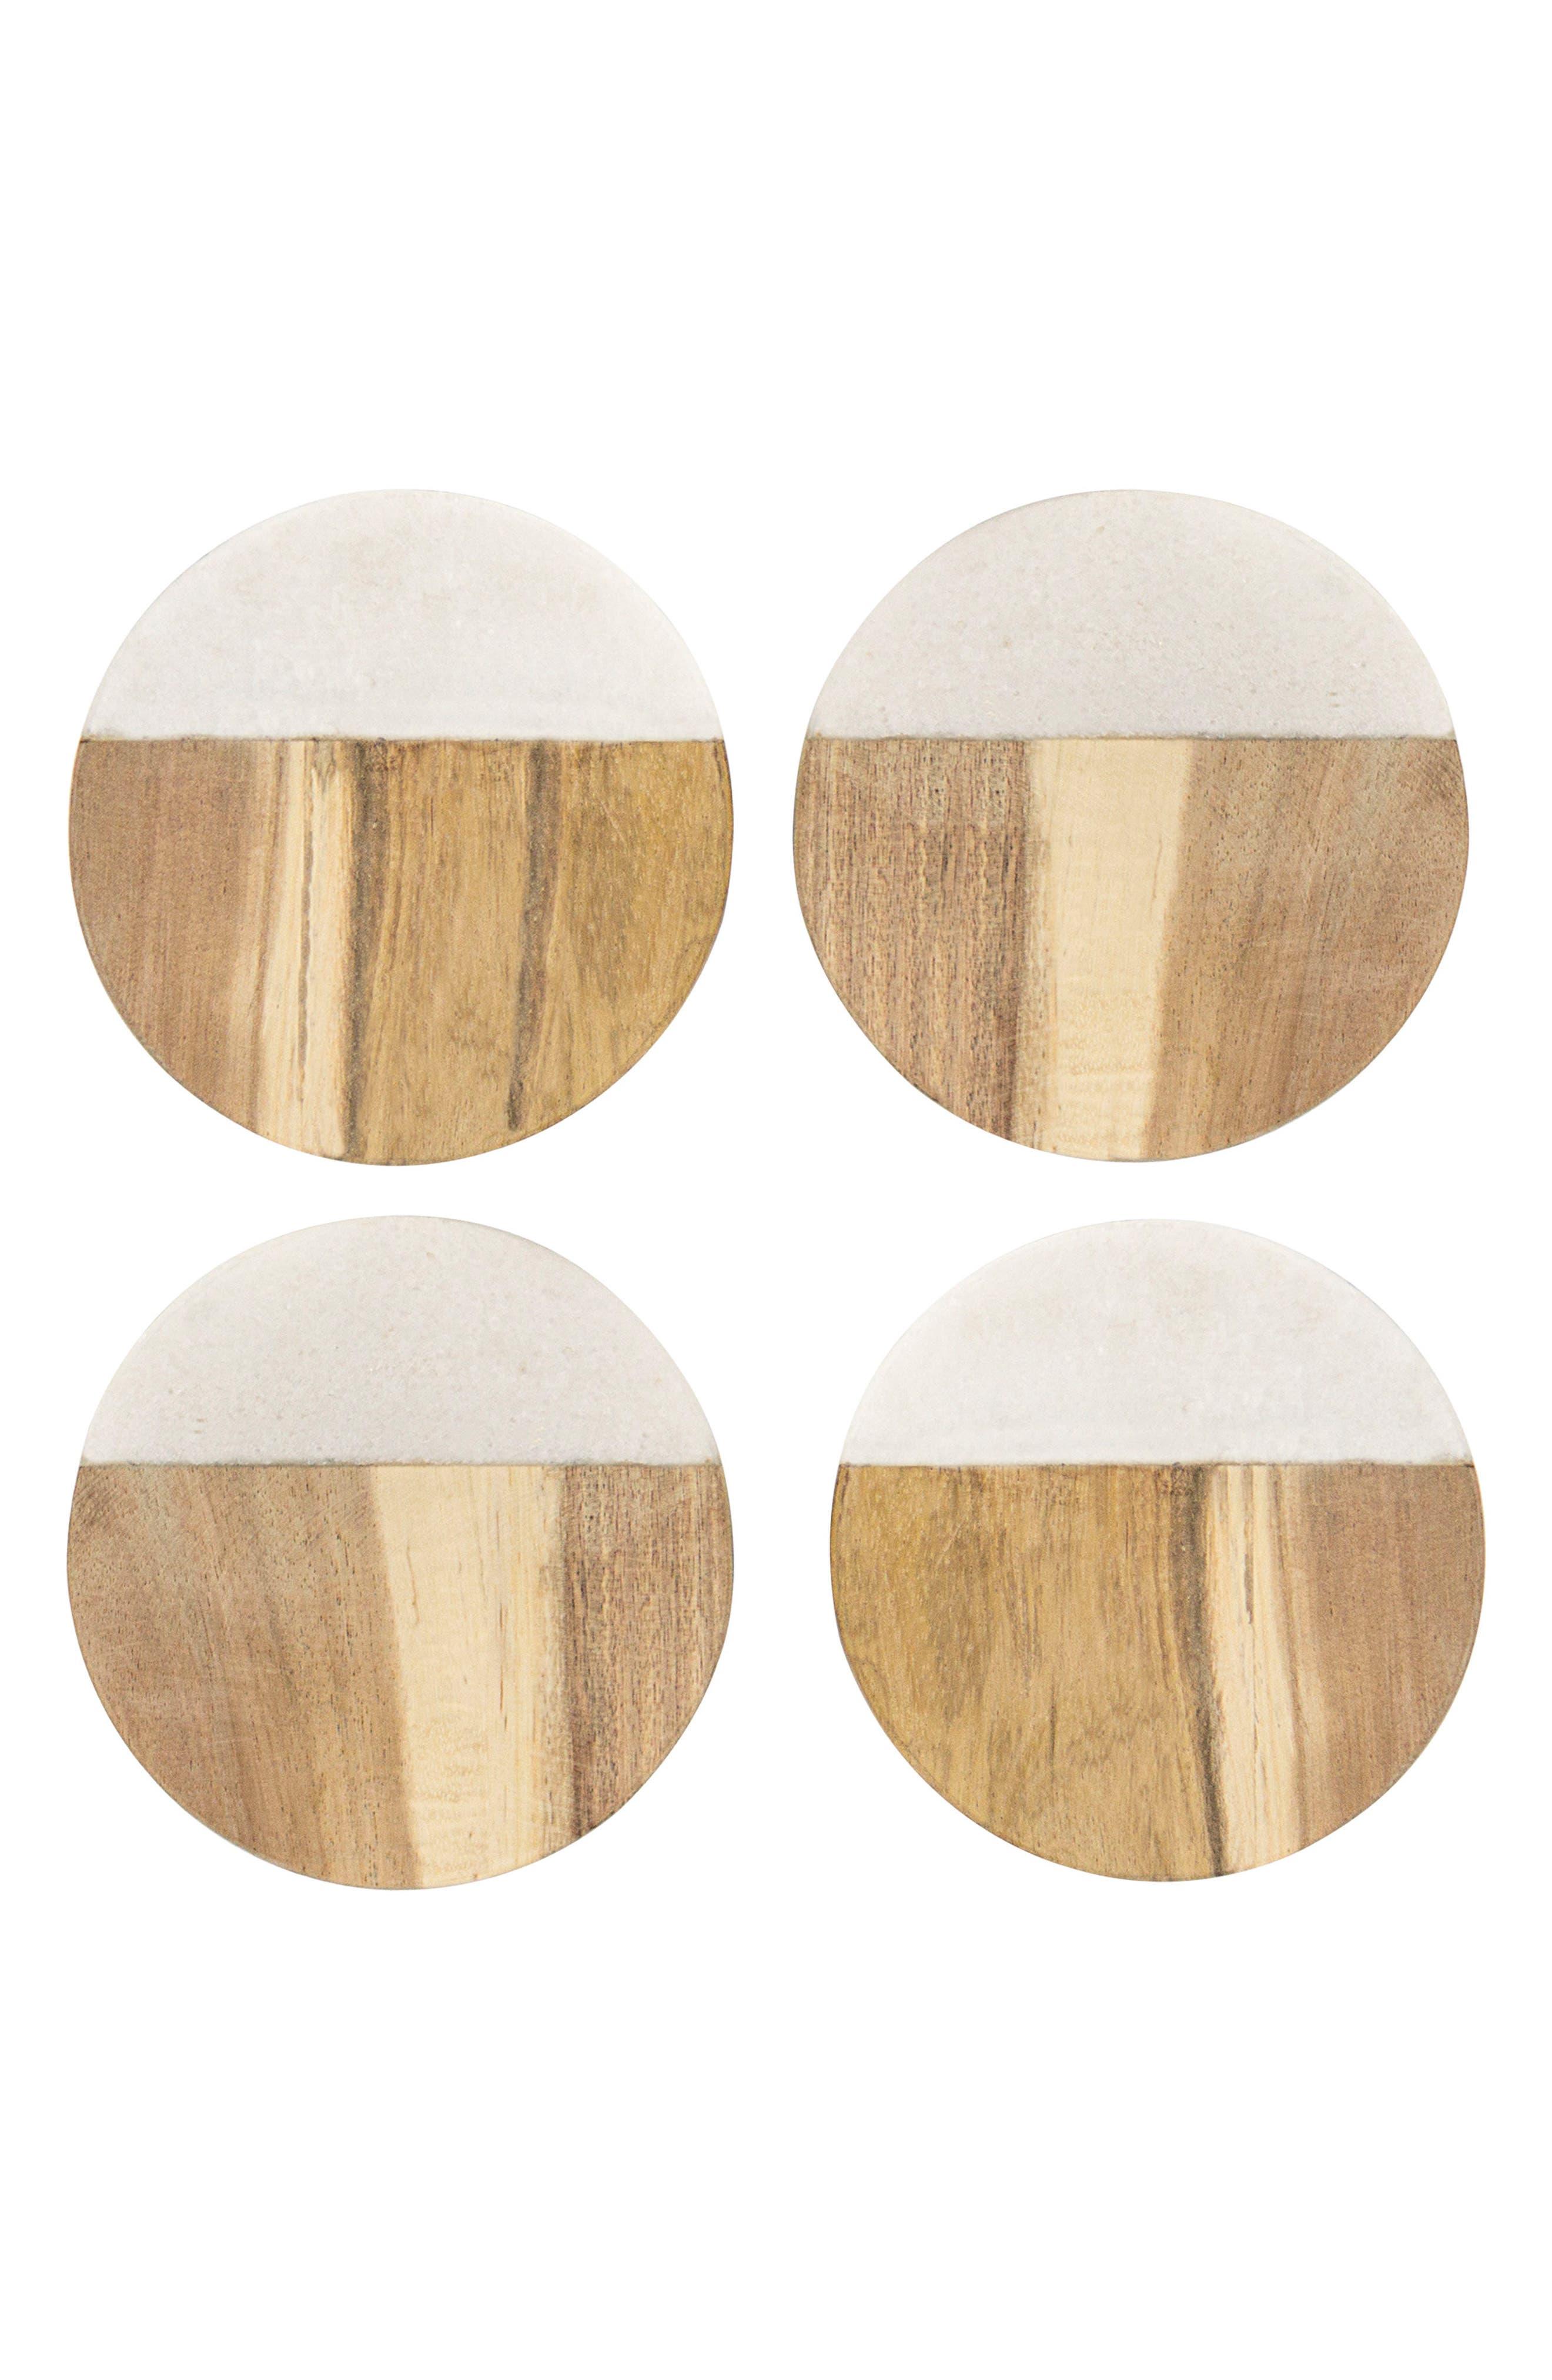 Monogram Set of 4 Marble & Acacia Wood Coasters,                         Main,                         color, BROWN